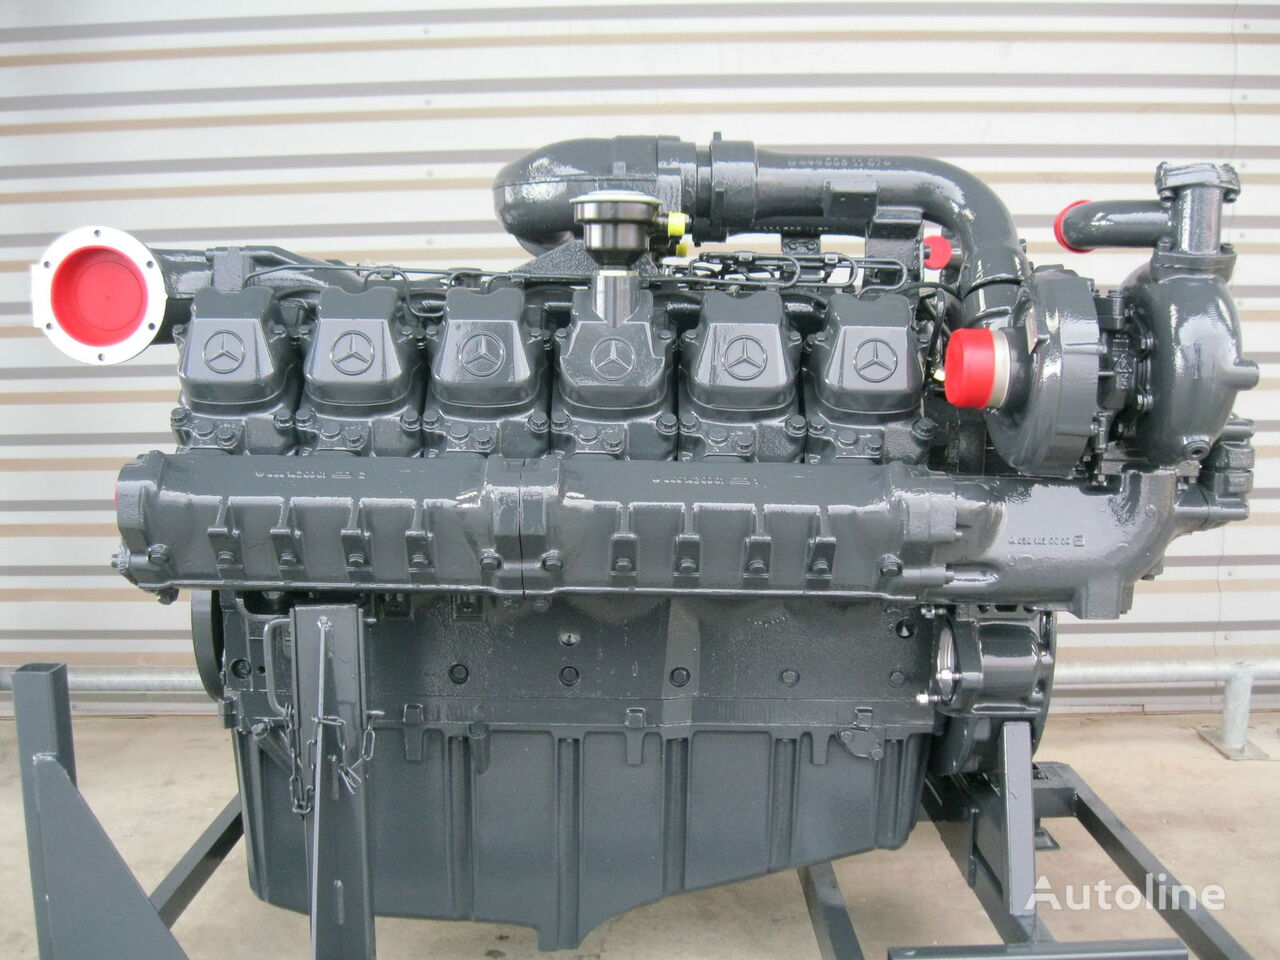 MERCEDES-BENZ OM444LA (LHM400 LHM800) motor para LIEBHERR grúa móvil nuevo